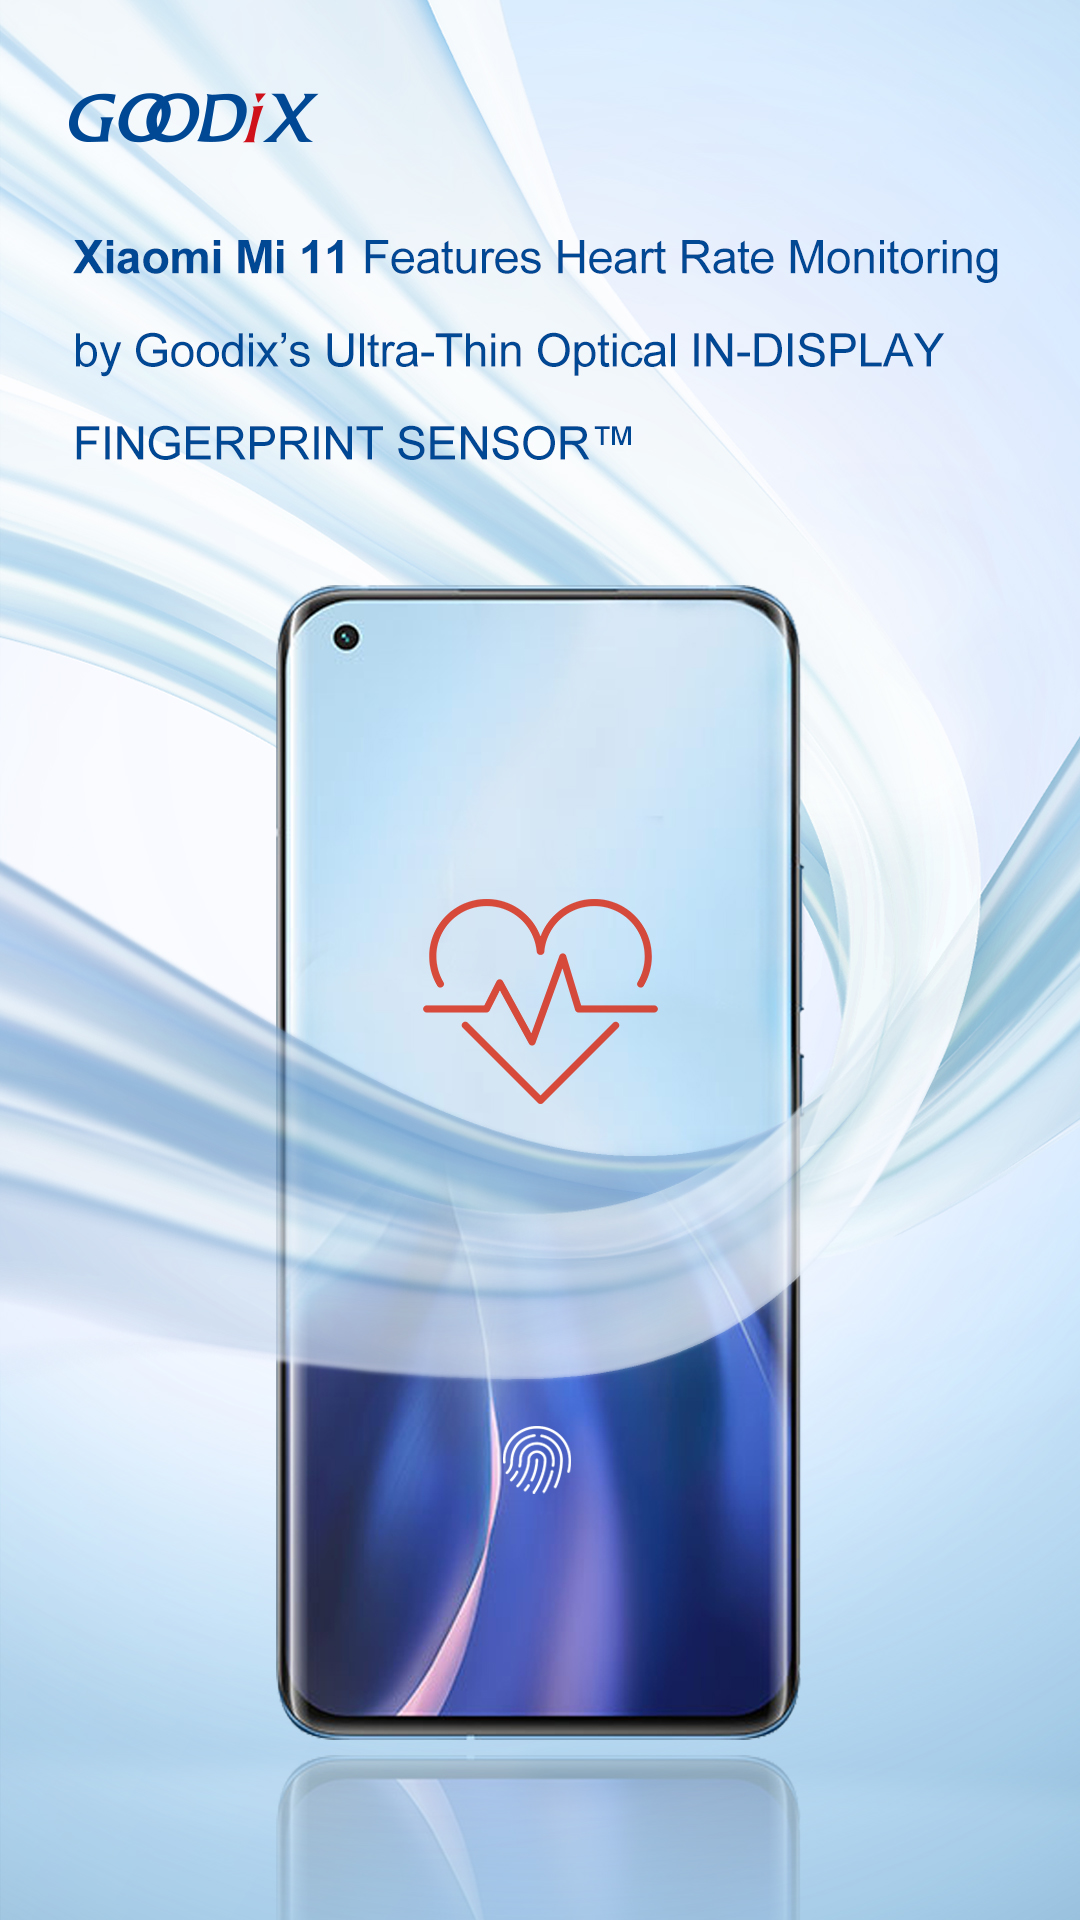 Xiaomi Mi 11 with integrated in-screen heart rate sensor